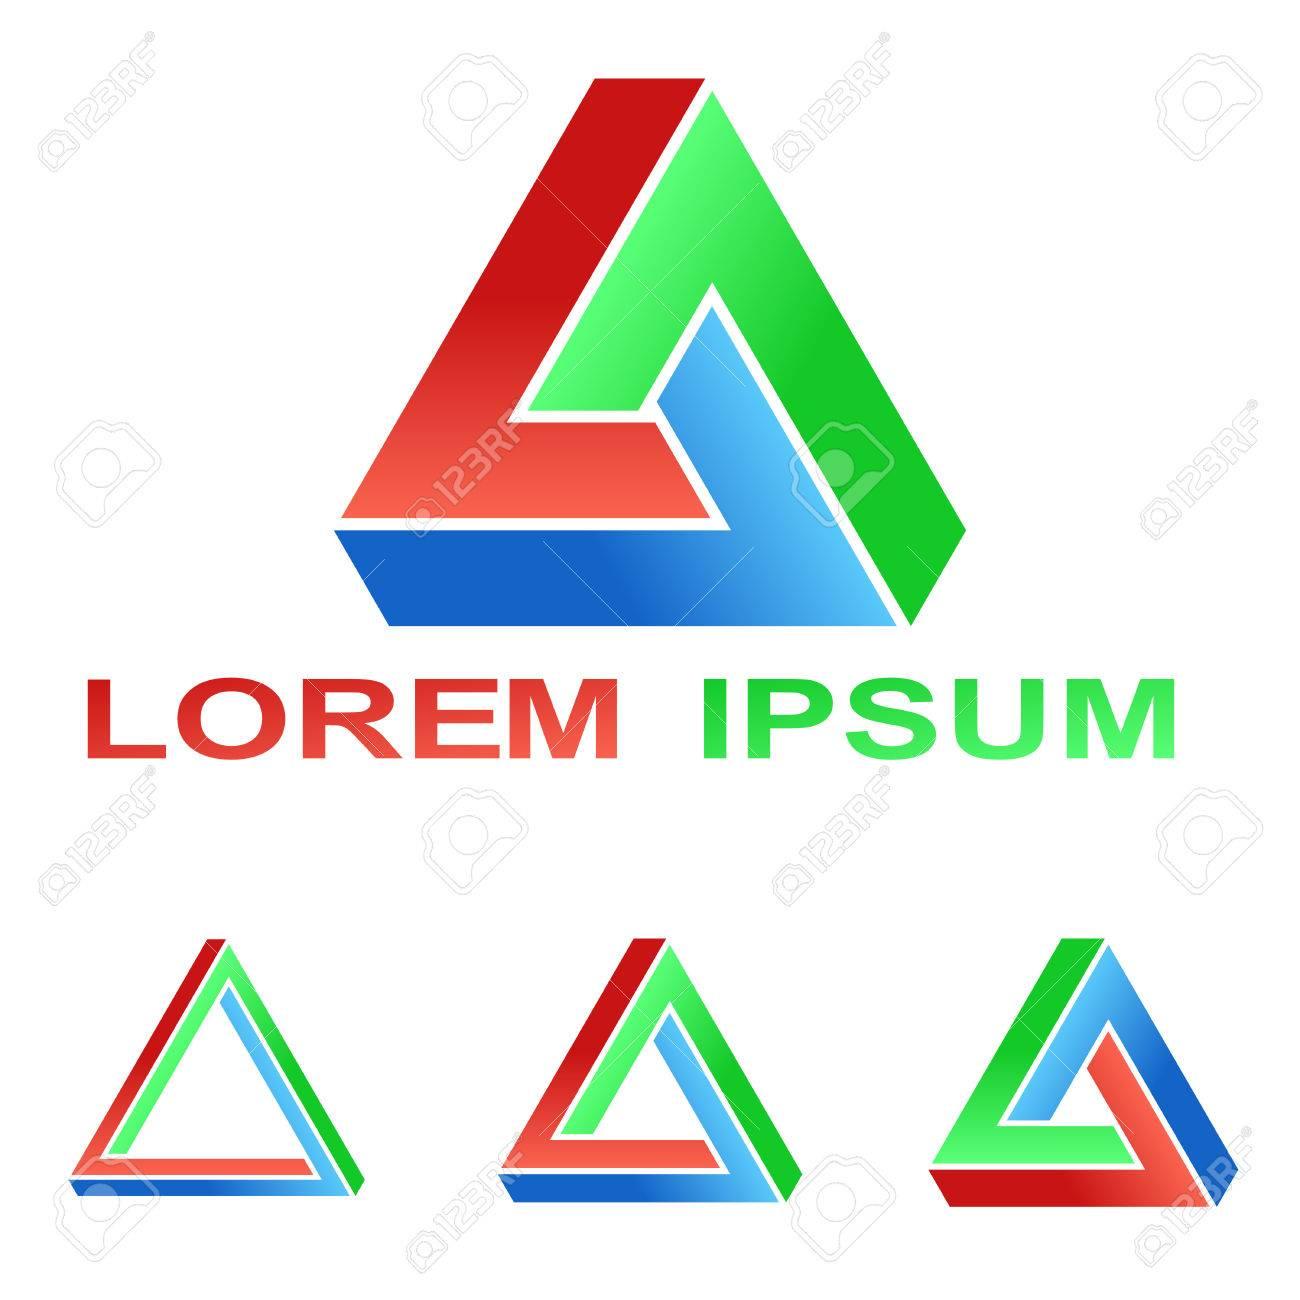 Penrose Triangle Technology Company Symbol Set Royalty Free Cliparts